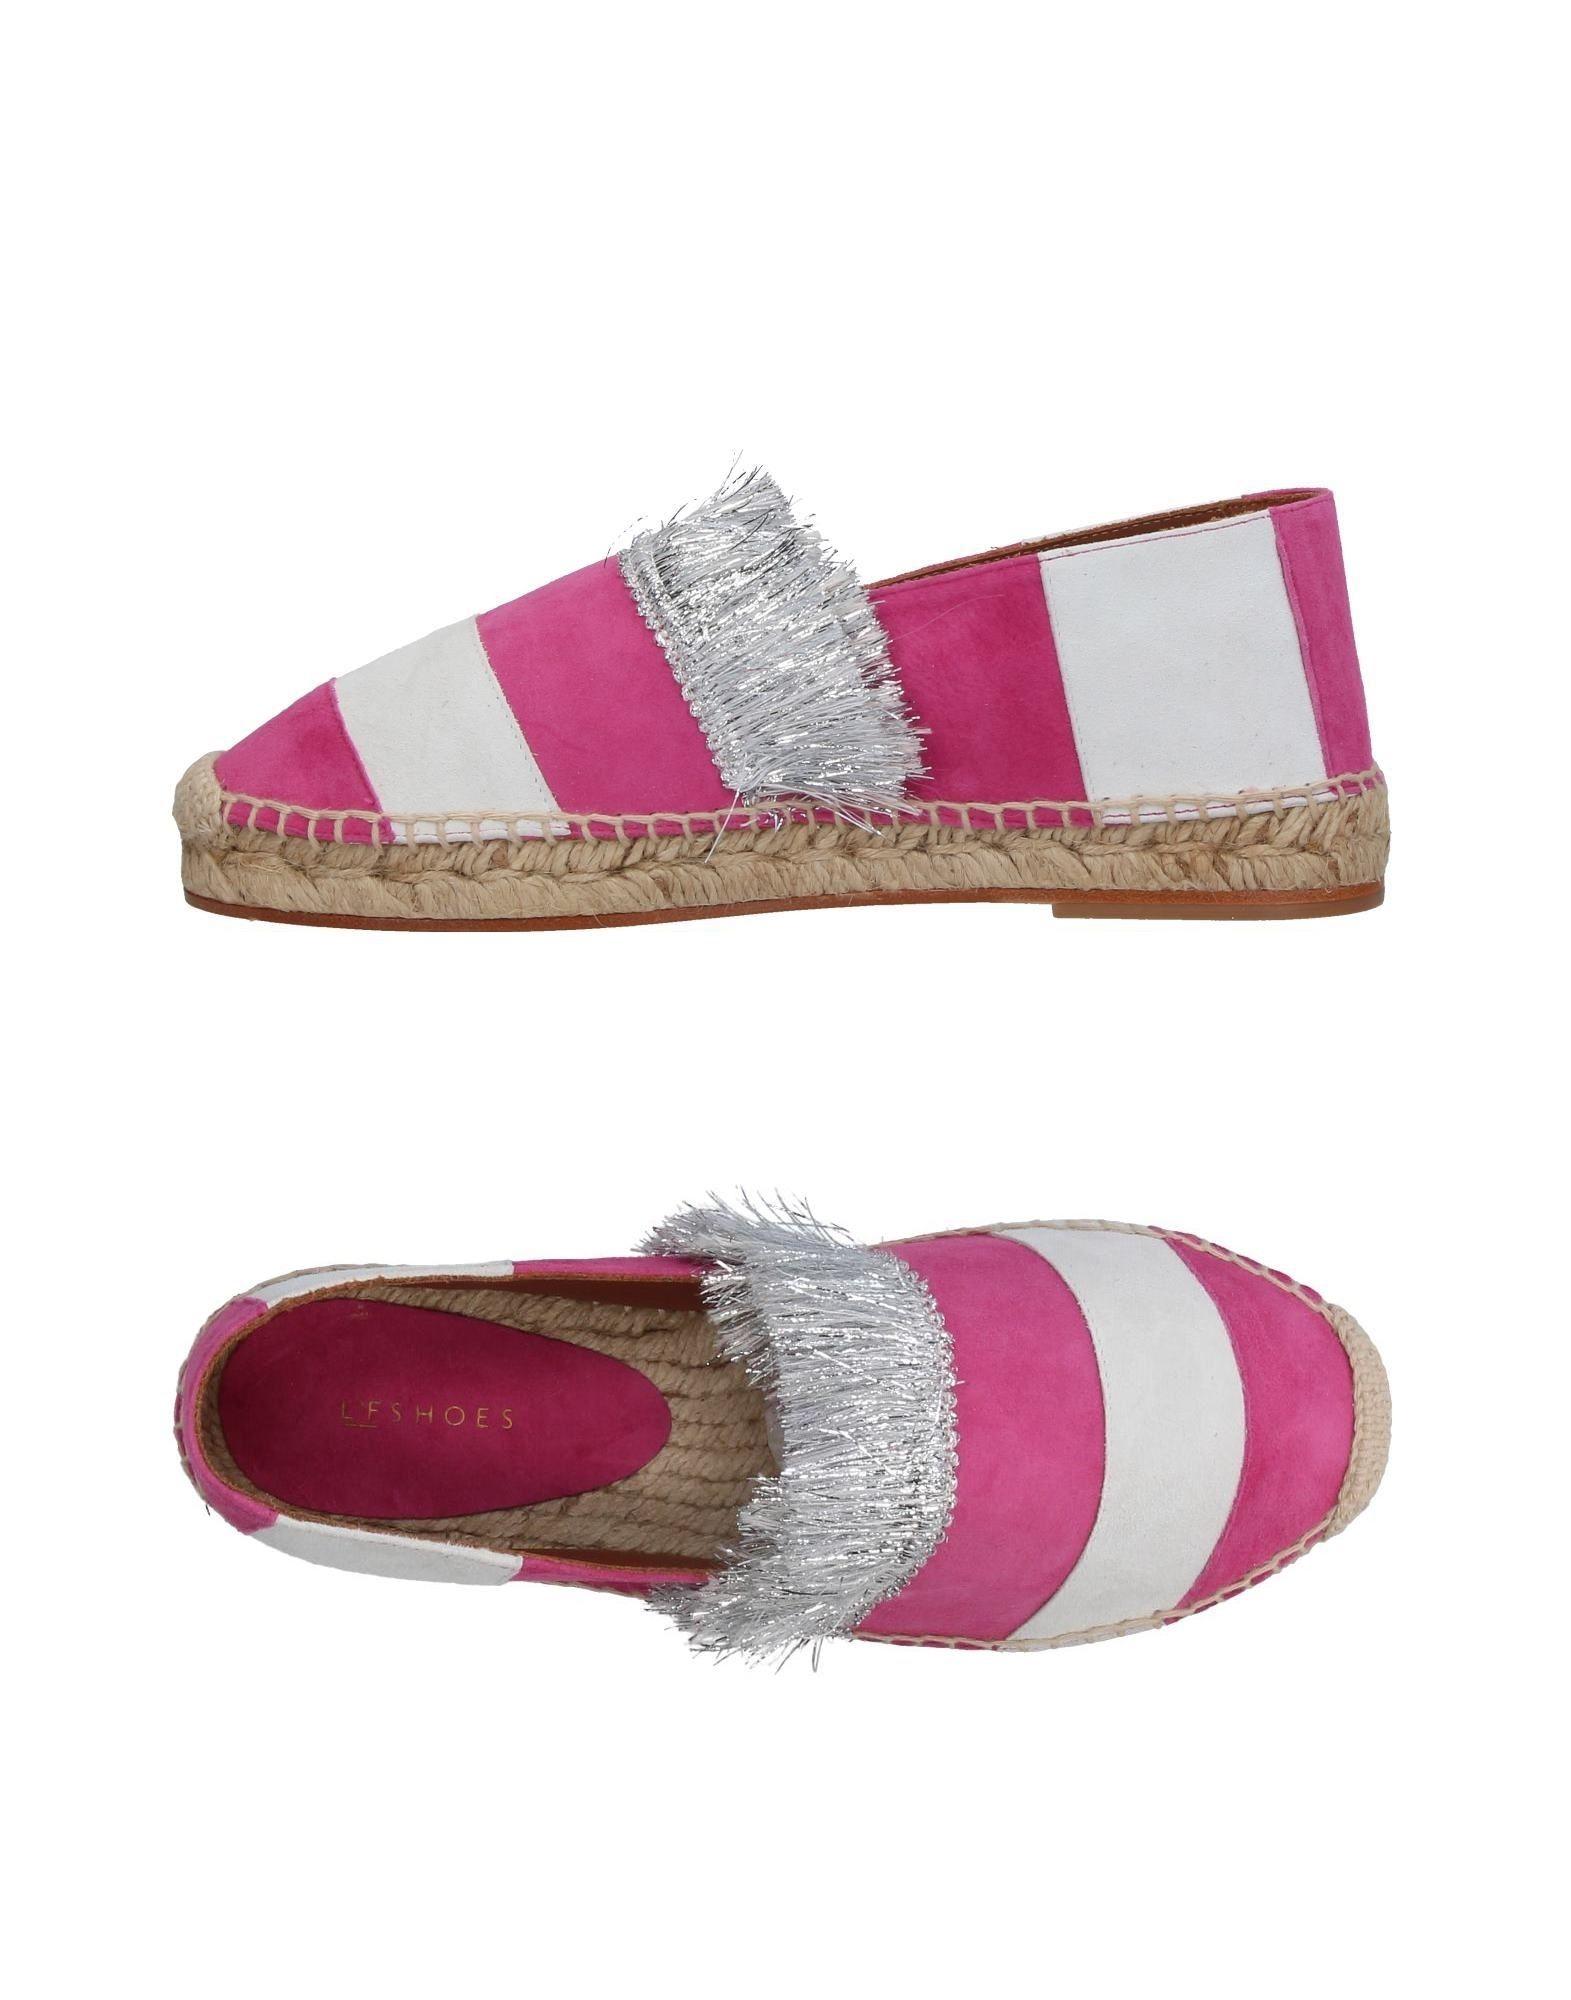 Espadrillas Lf Shoes Donna - Acquista online su